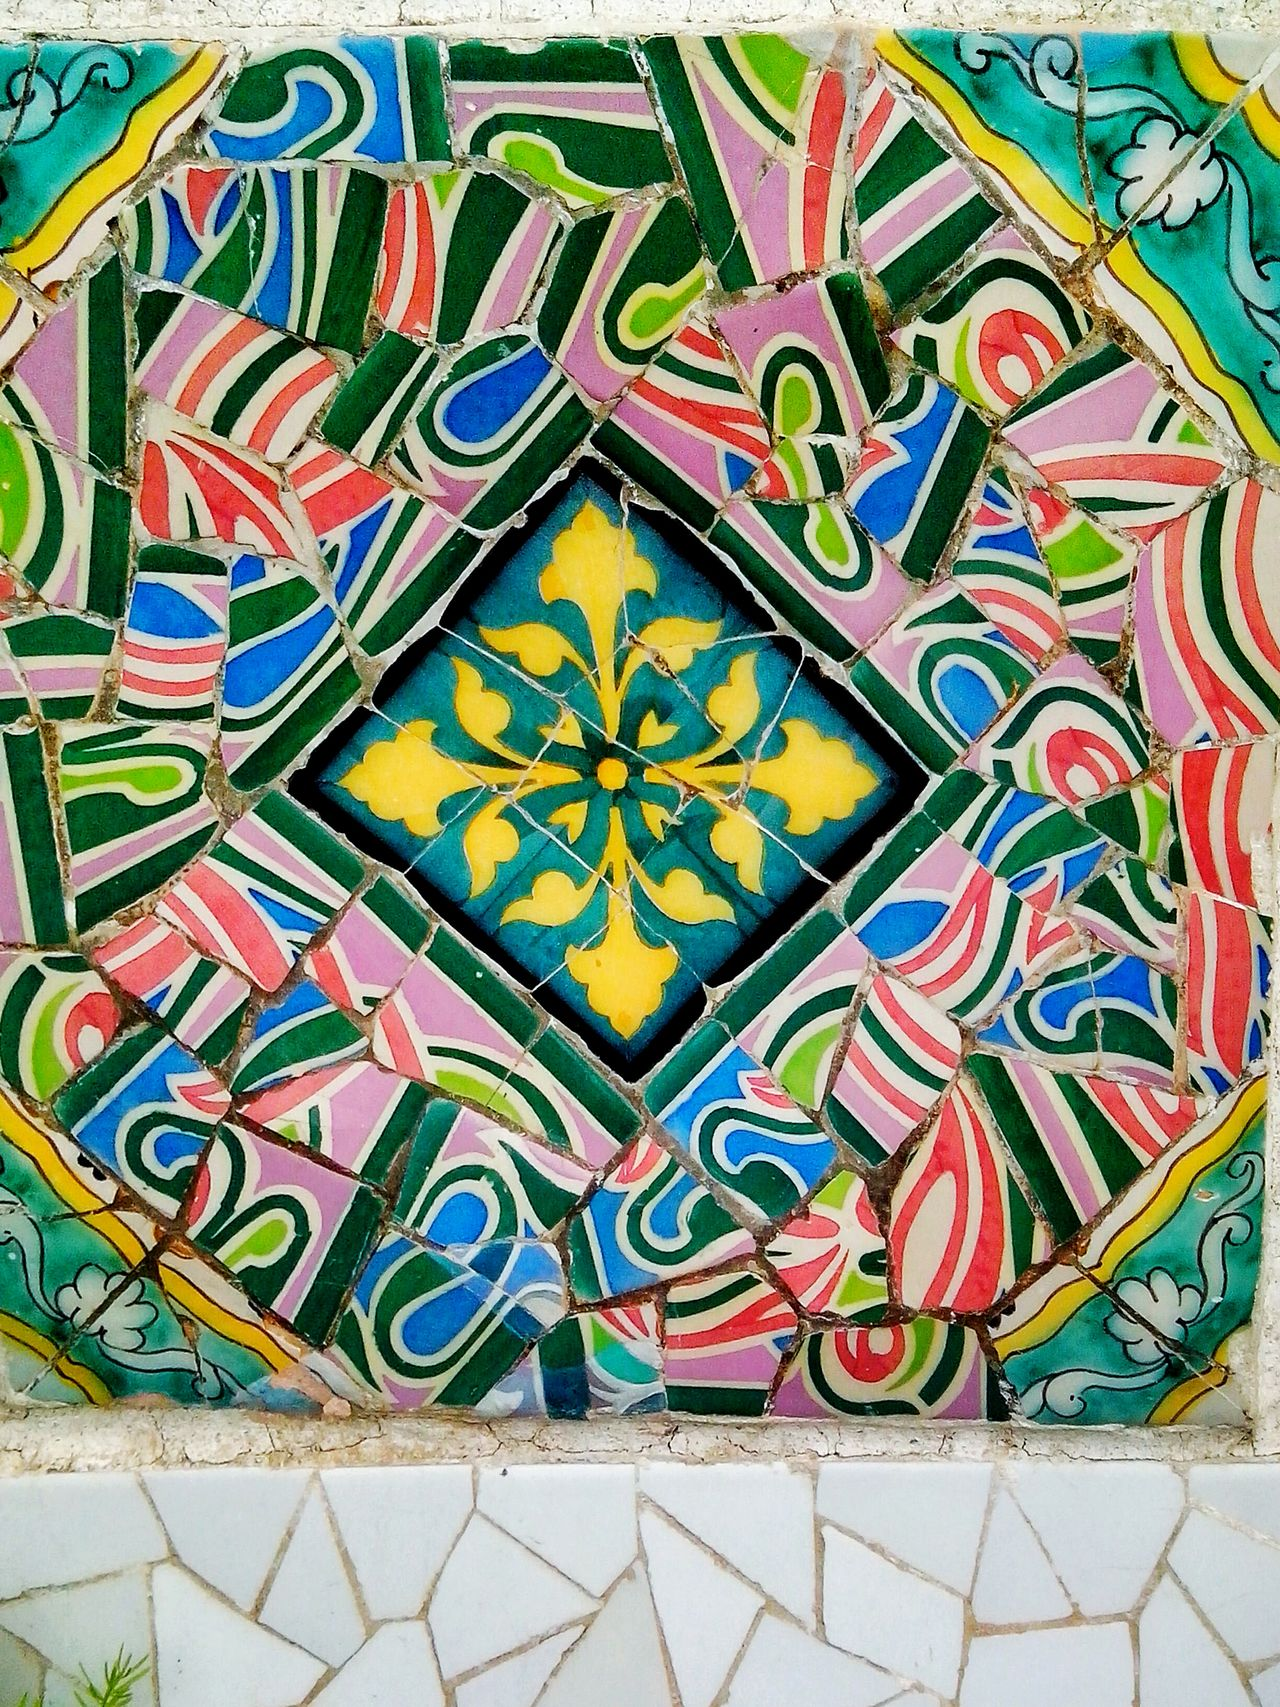 Art And Craft Multi Colored Pattern Creativity ArtWork Antoni Gaudí Textured  Ceramic Art Ceramics Barcelona, Spain Barcelona Park Guell Decoration Gaudi Outdoors Bright Colors Backgrounds Background Pattern, Texture, Shape And Form Famous Place Modern Art